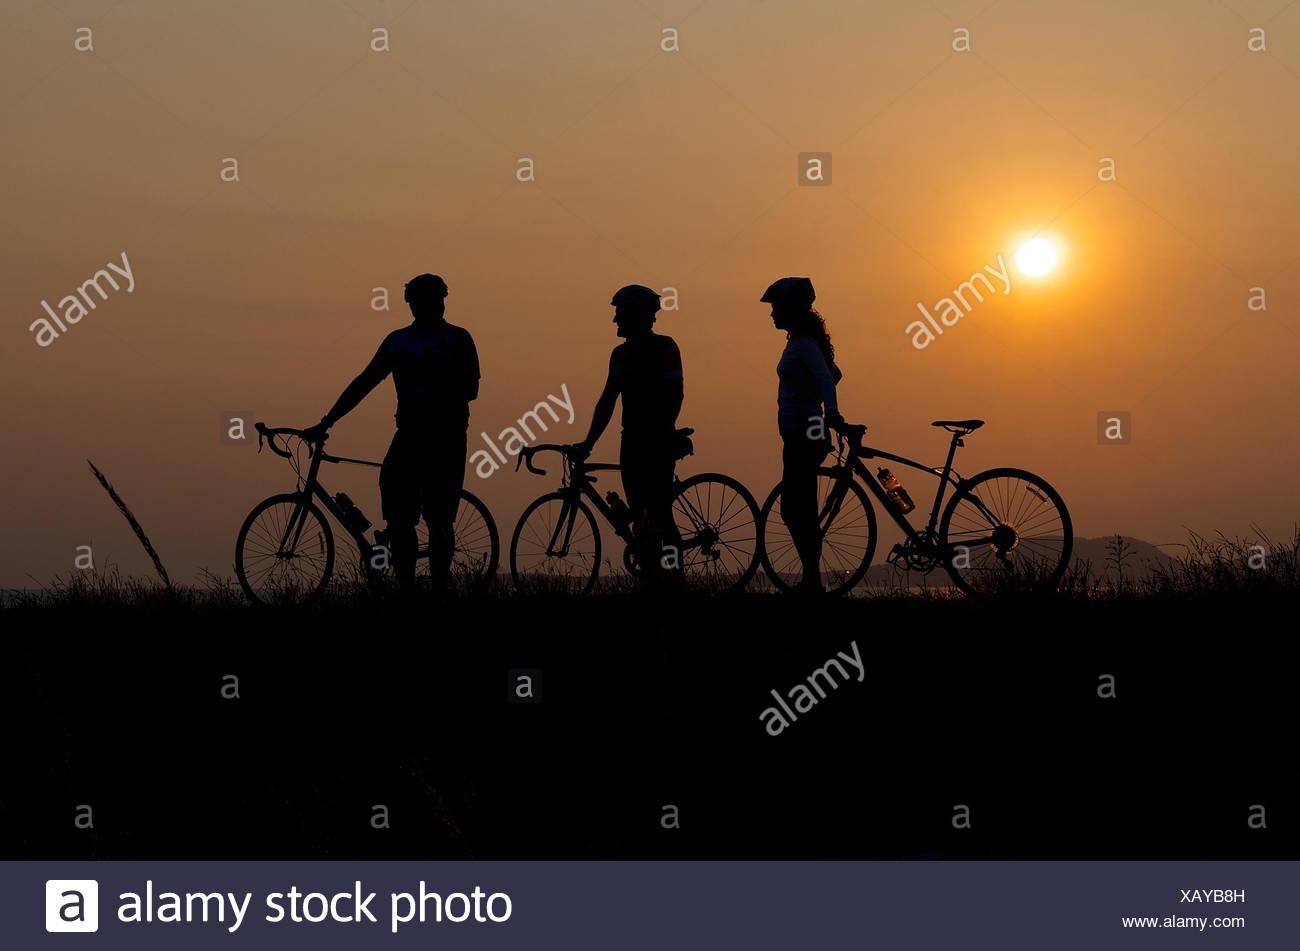 Silueta de tres ciclistas al atardecer Imagen De Stock